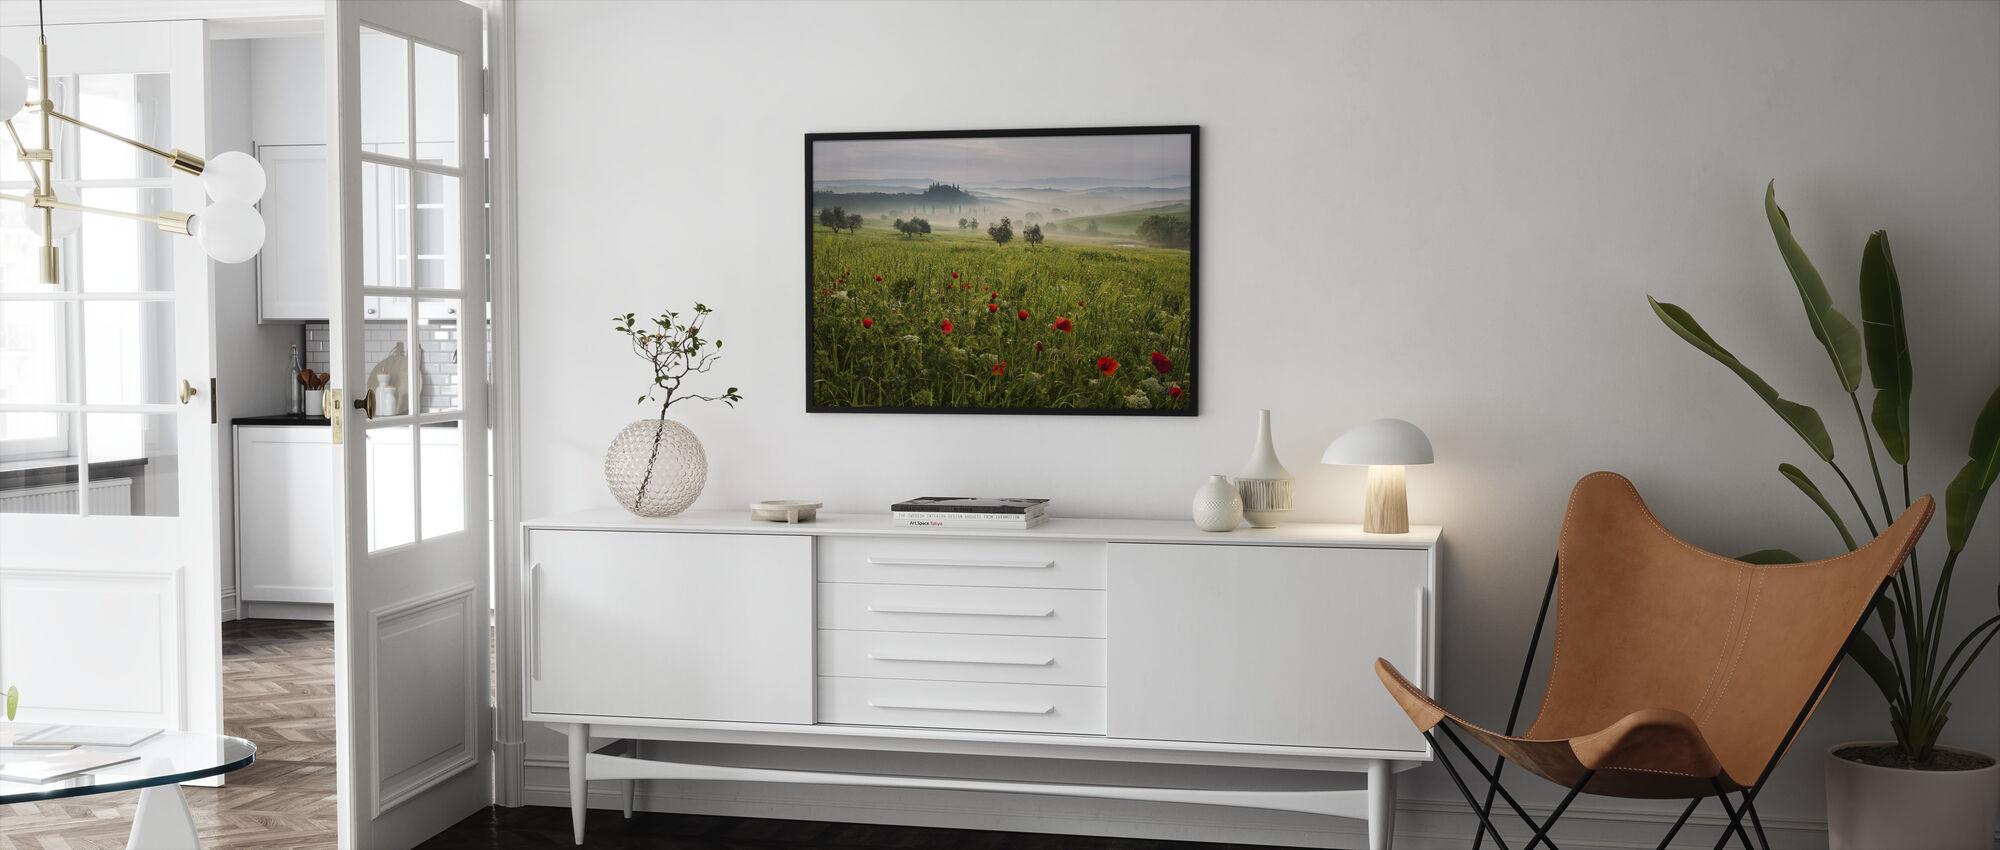 Toscaanse lente - Ingelijste print - Woonkamer